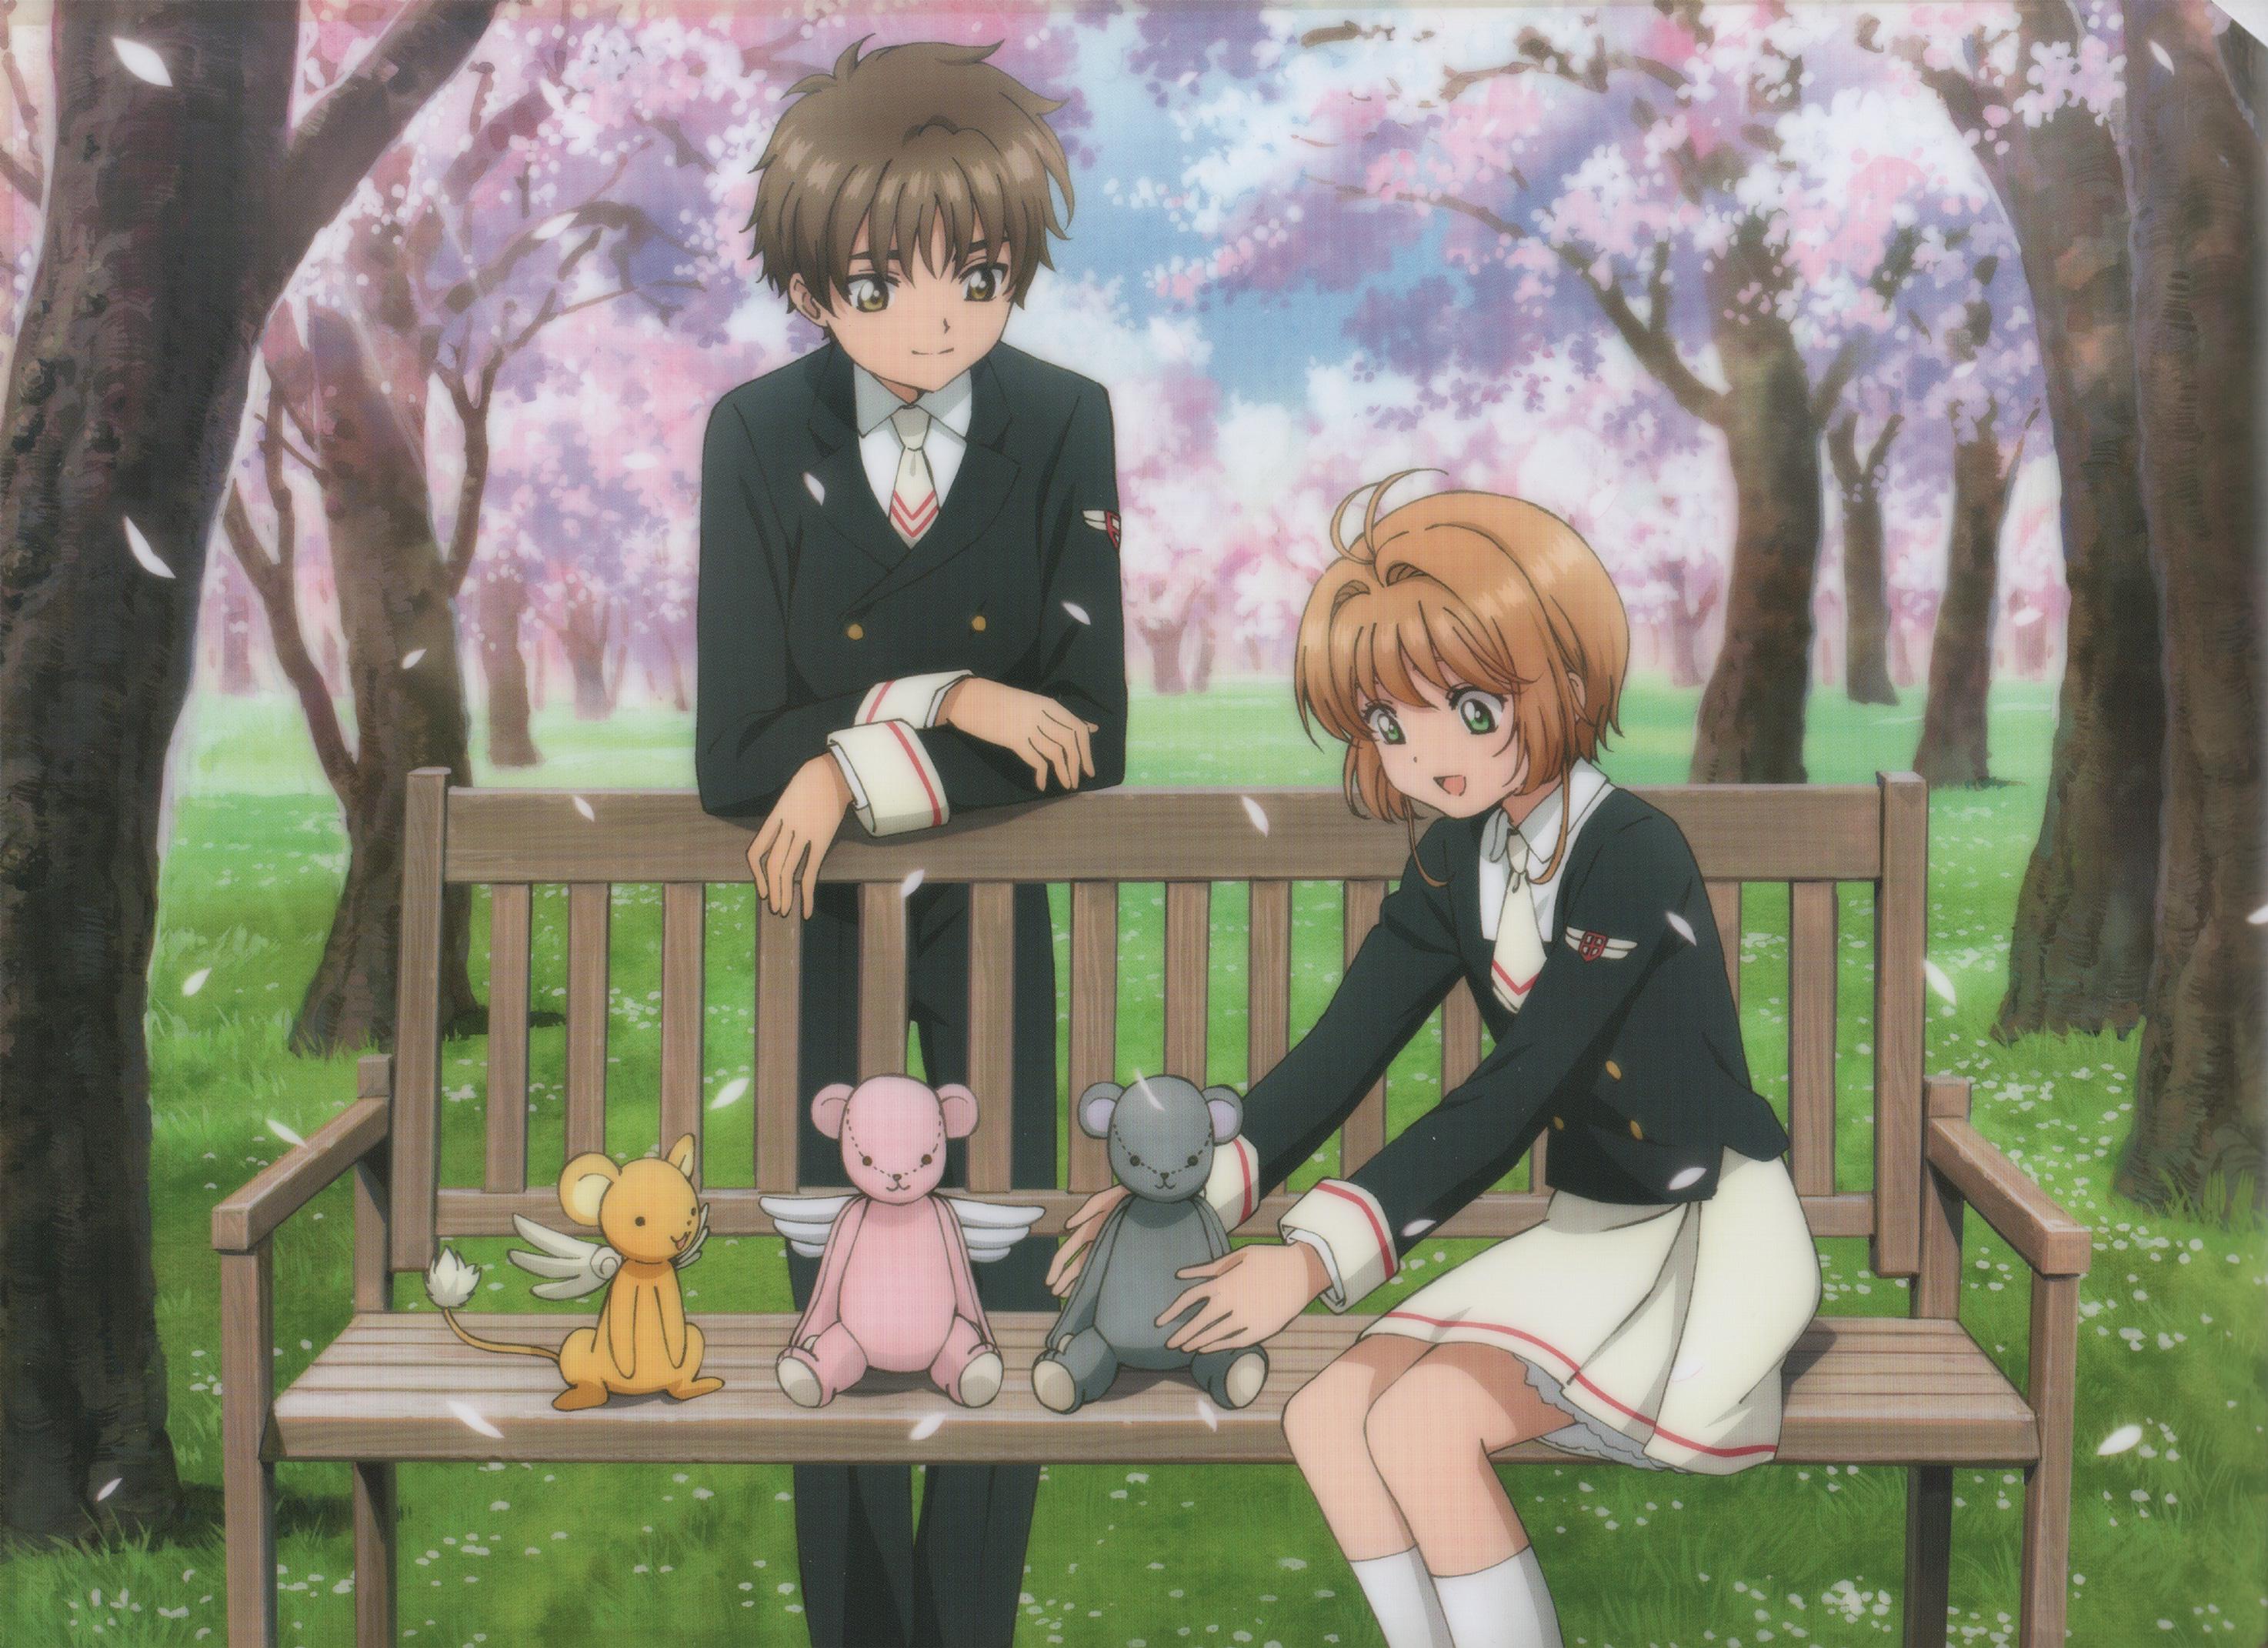 Cardcaptor Sakura: Clear Card-hen Image #2294435 - Zerochan Anime Image  Board